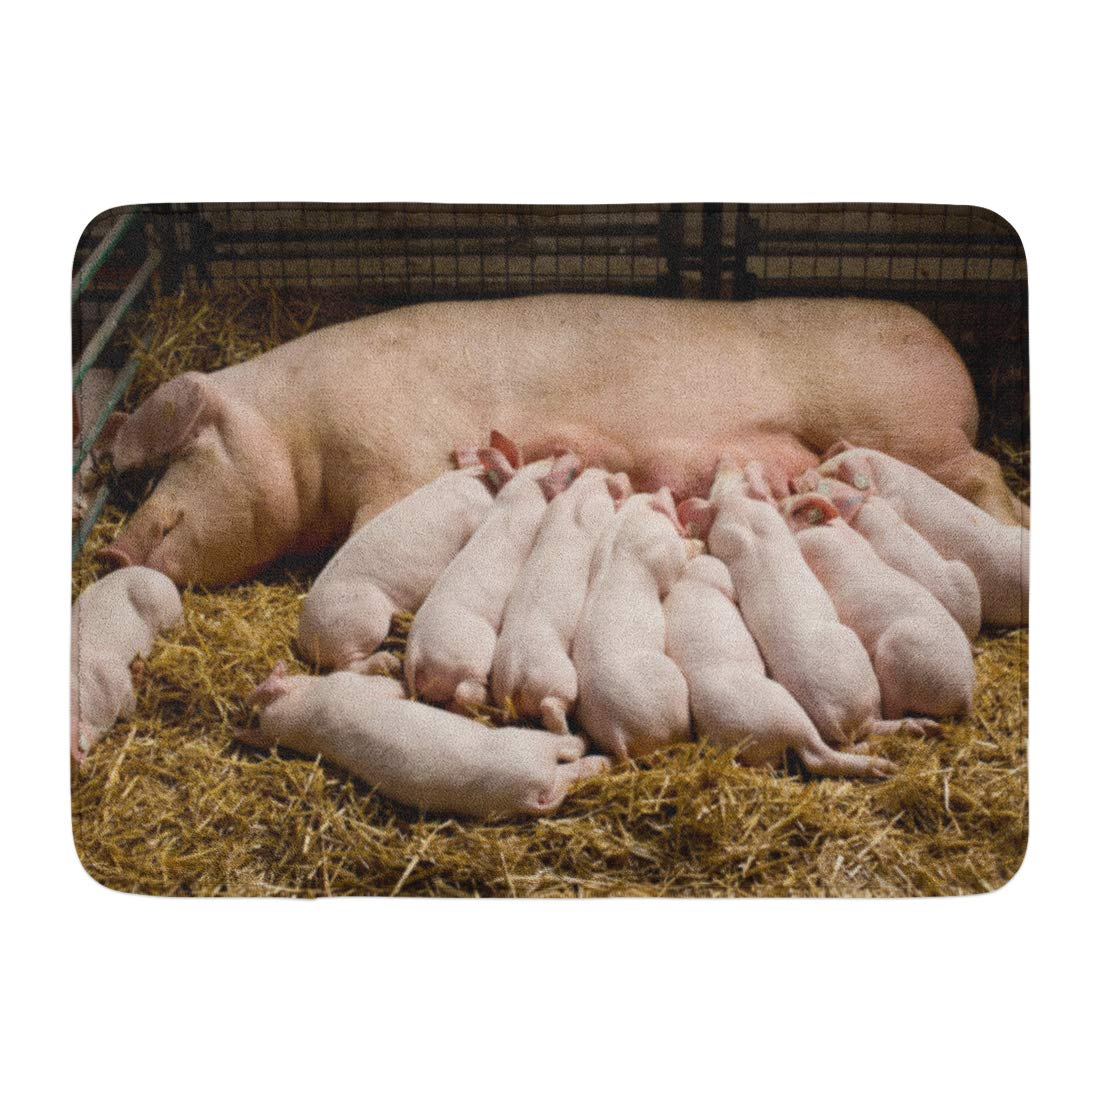 Emvency Bath Mat Animal Pink Pig Fertile Sow Lying on Hay and Piglets Suckling in Barn Baby Farming Bathroom Decor Rug 16'' x 24''